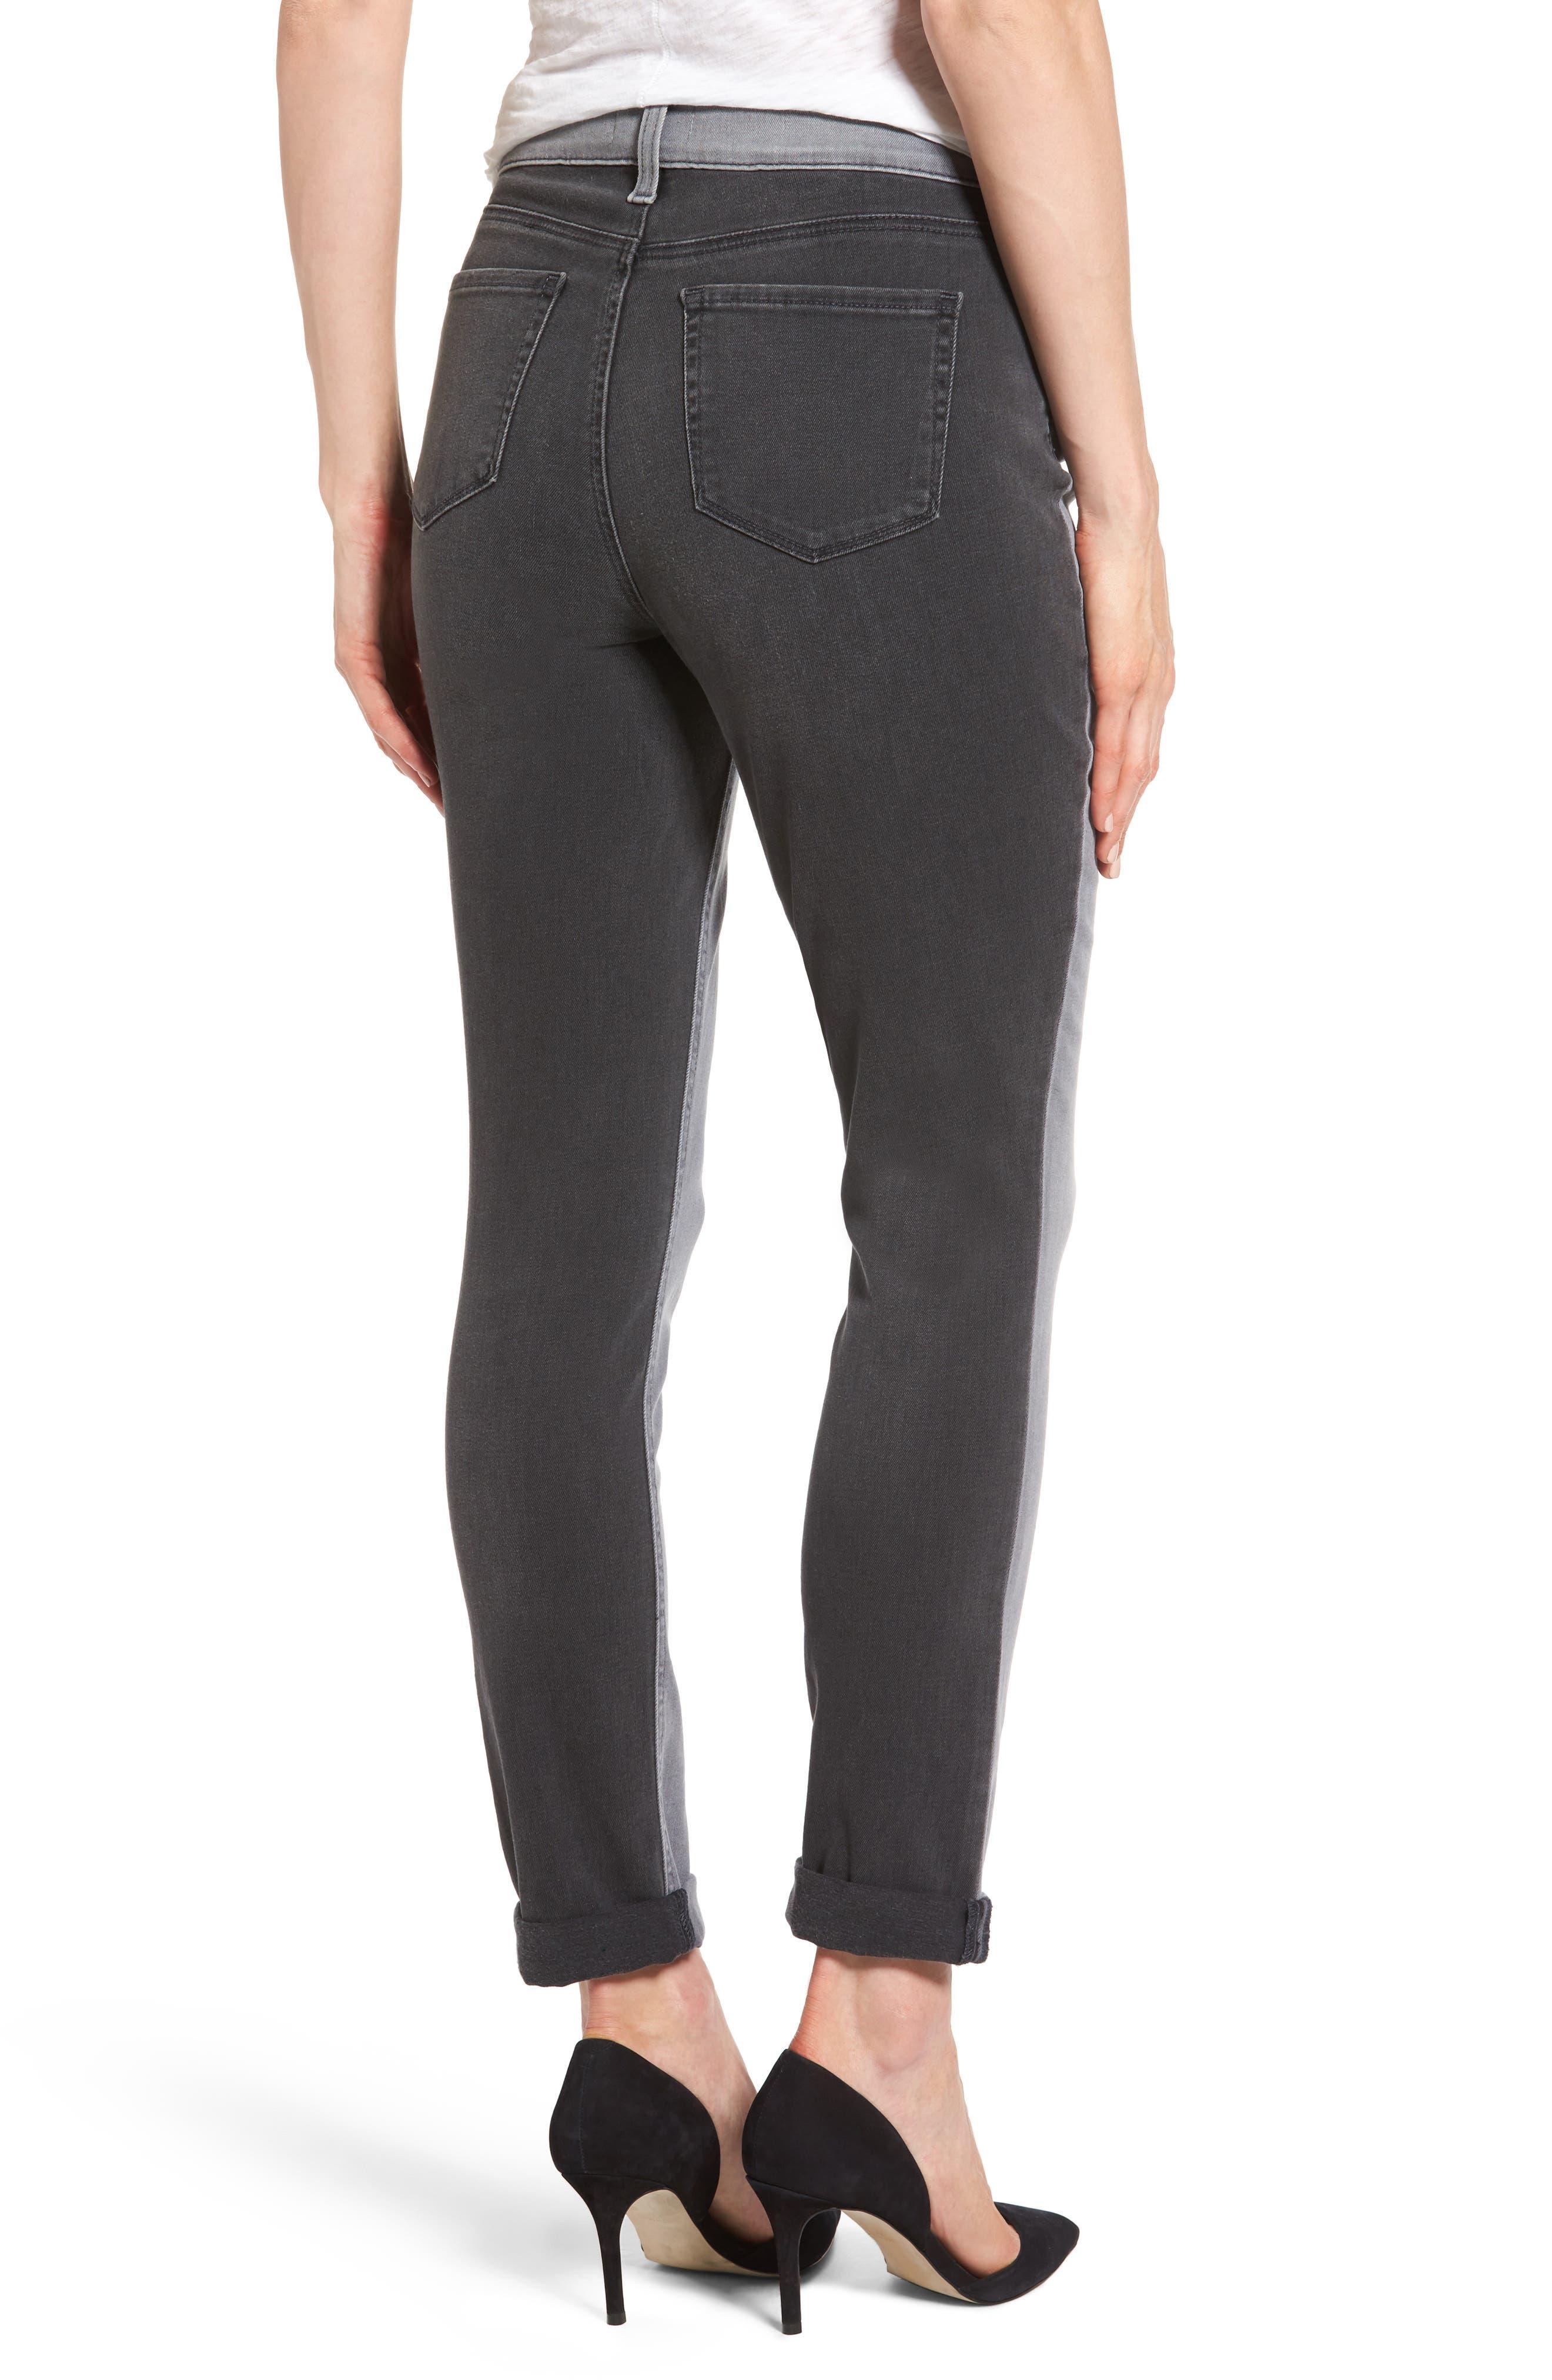 Two Tone Stretch Girlfriend Jeans,                             Alternate thumbnail 2, color,                             Cassiar